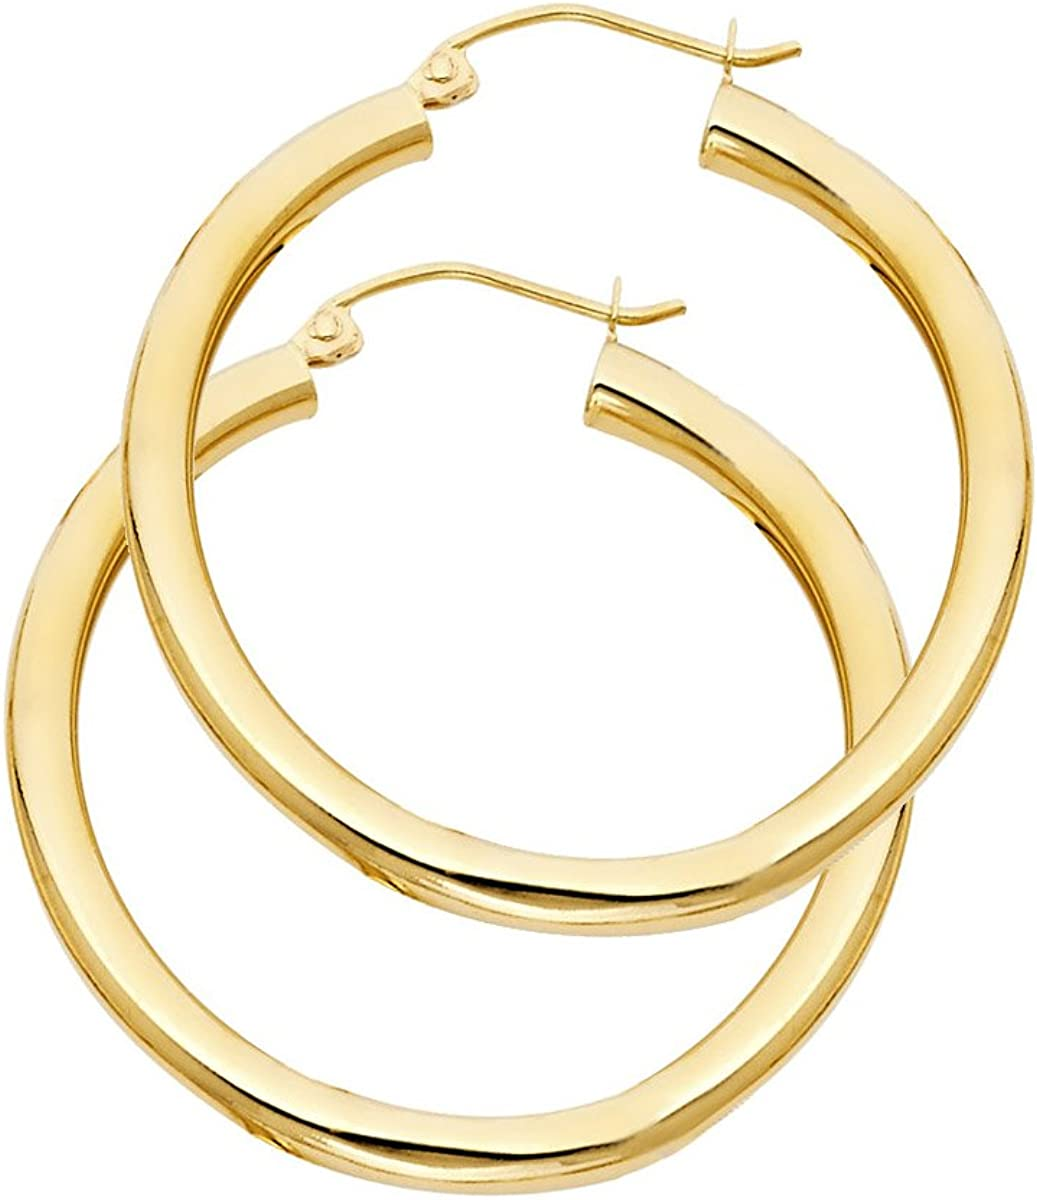 14k Yellow Gold 3mm Thickness Hinged Plain Hoop Earrings Diameter -35mm